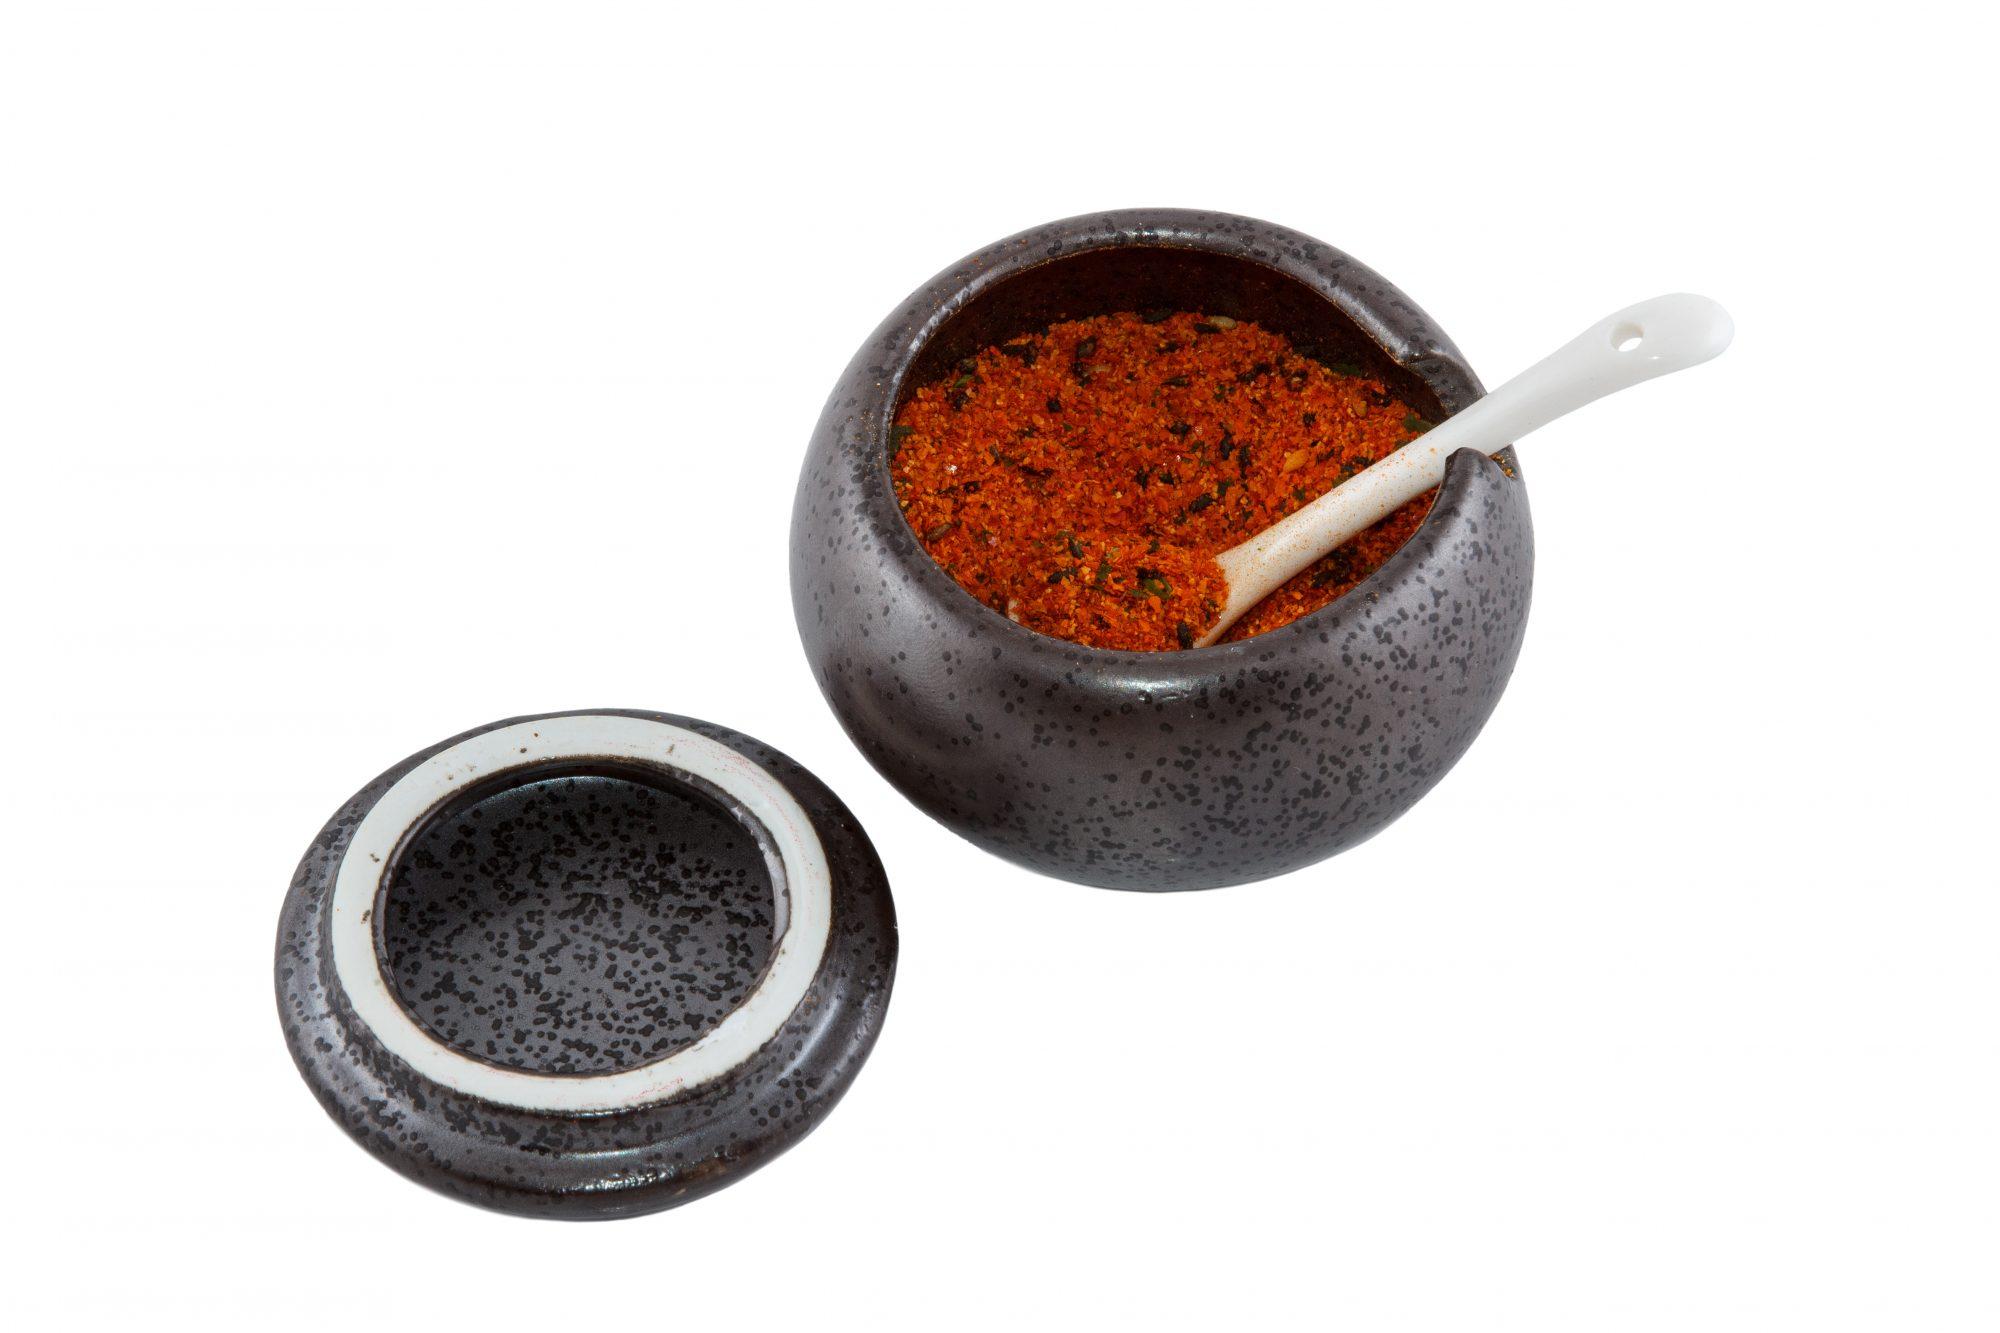 <p>Nama Shichimi Tougarashi Japanese chili)</p>